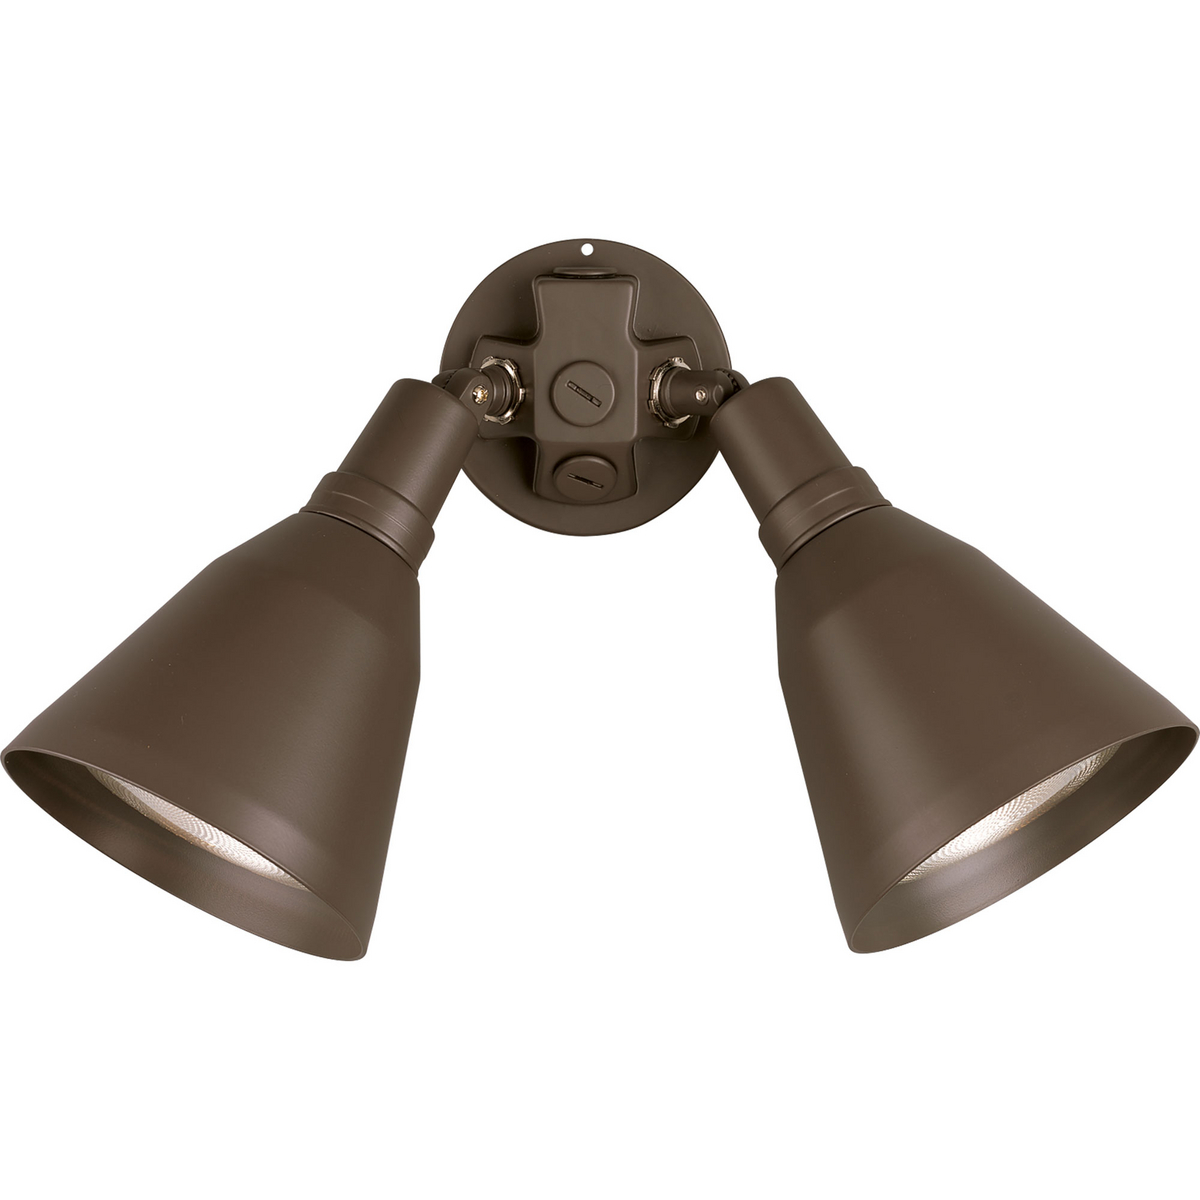 PRO P5203-20 2X150M Antique Bronze Outdoor Flood Light